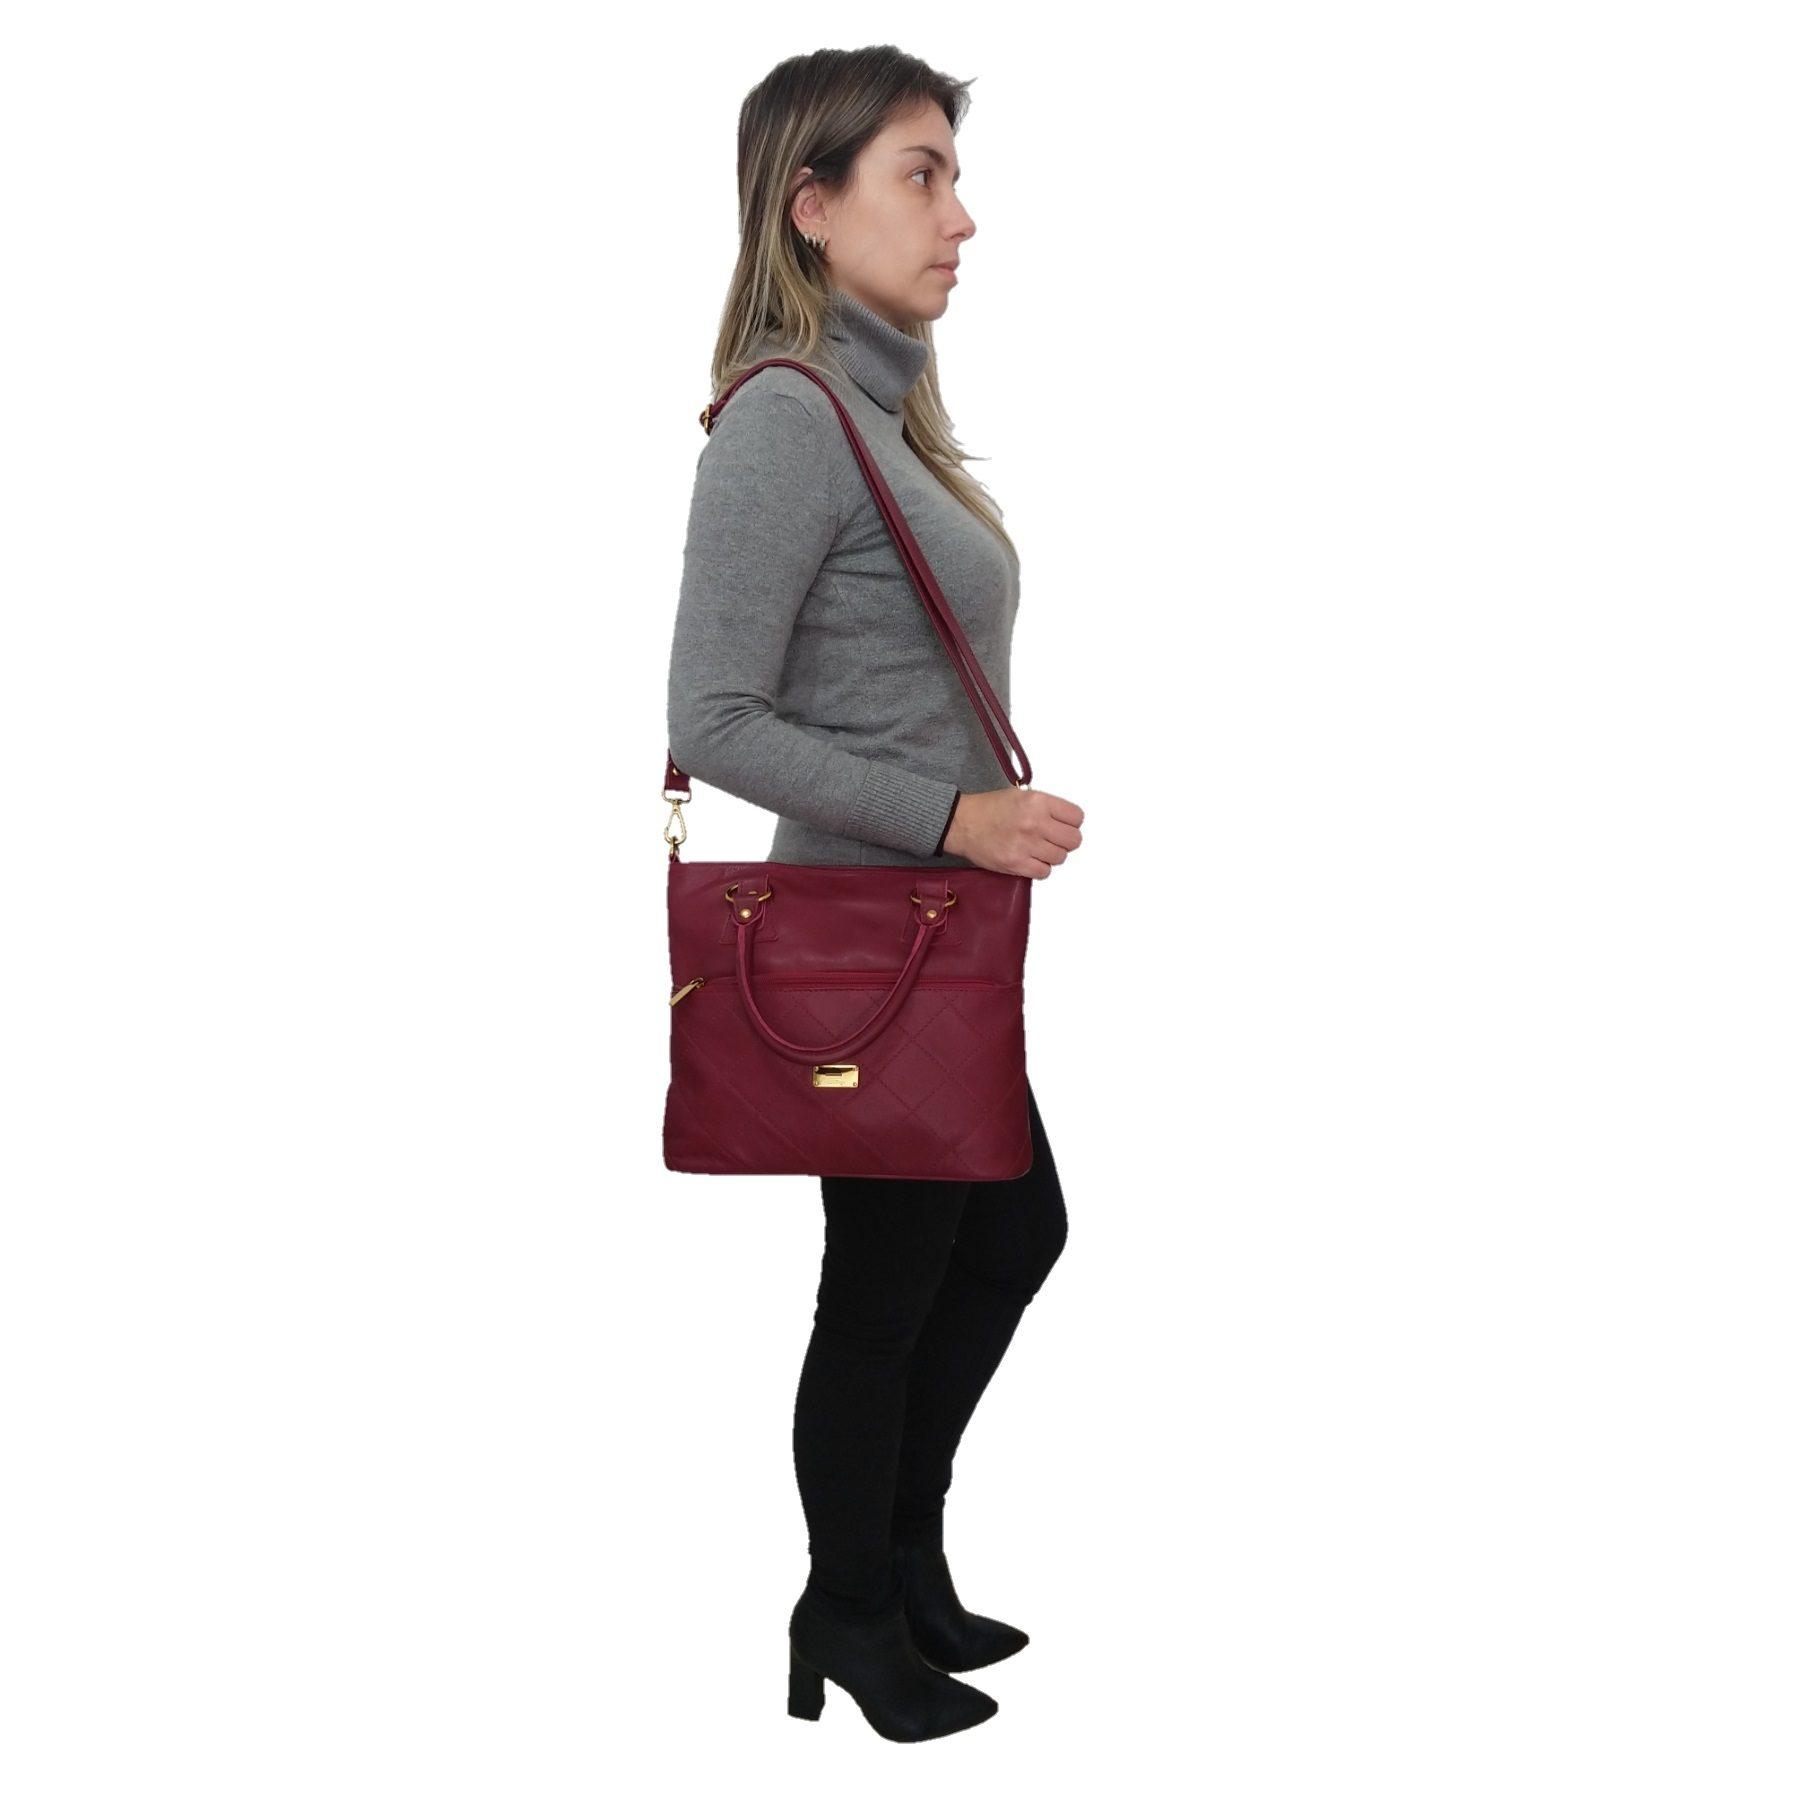 Bolsa Sacola TopGrife Shopper Couro Bordô  - SAPATOWEB.COM